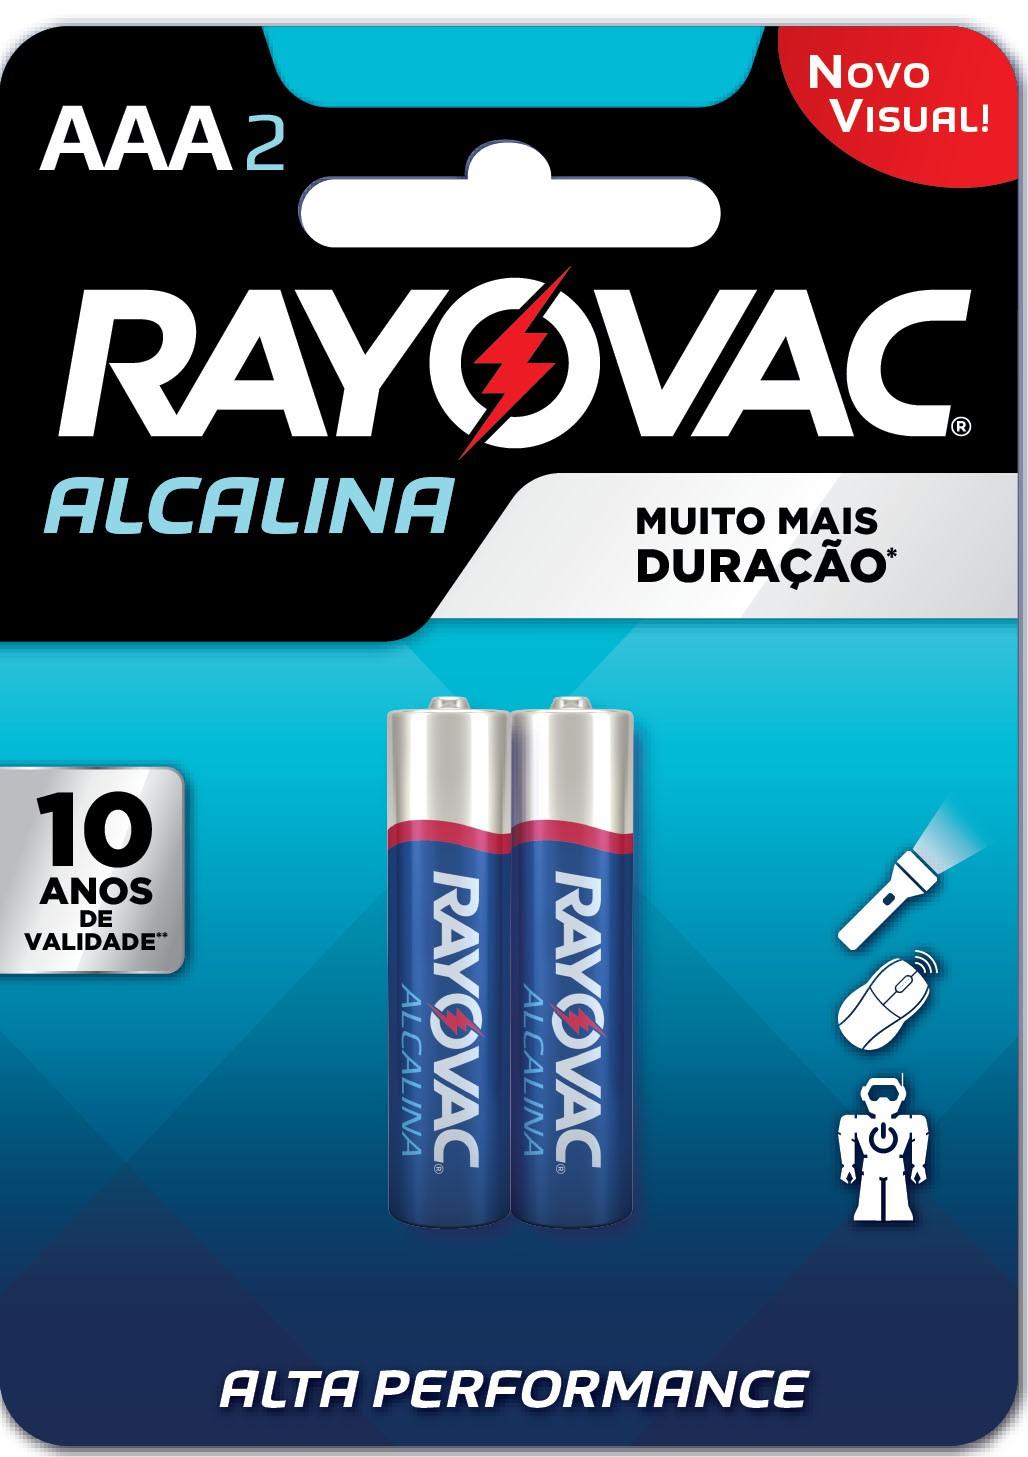 02 Pilhas AAA Alcalina RAYOVAC 1 cart c/ 2 unid